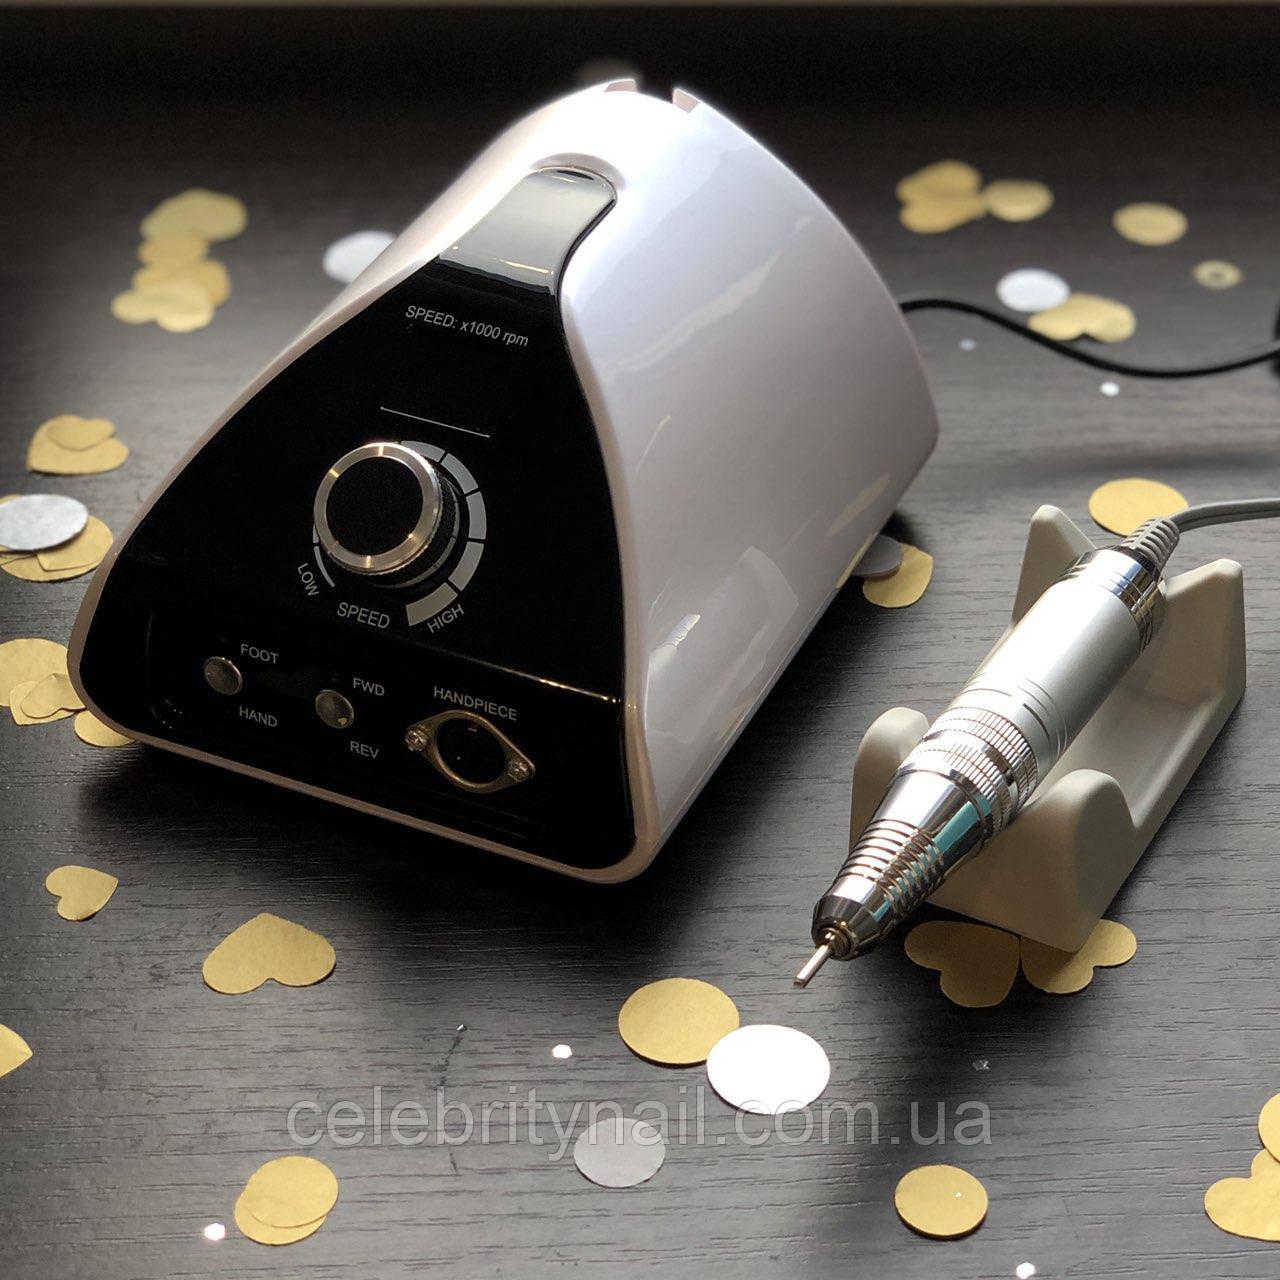 Фрезер для маникюра Nail Drill ZS-711 PRO WHITE (65 Вт, 35000 оборотов)